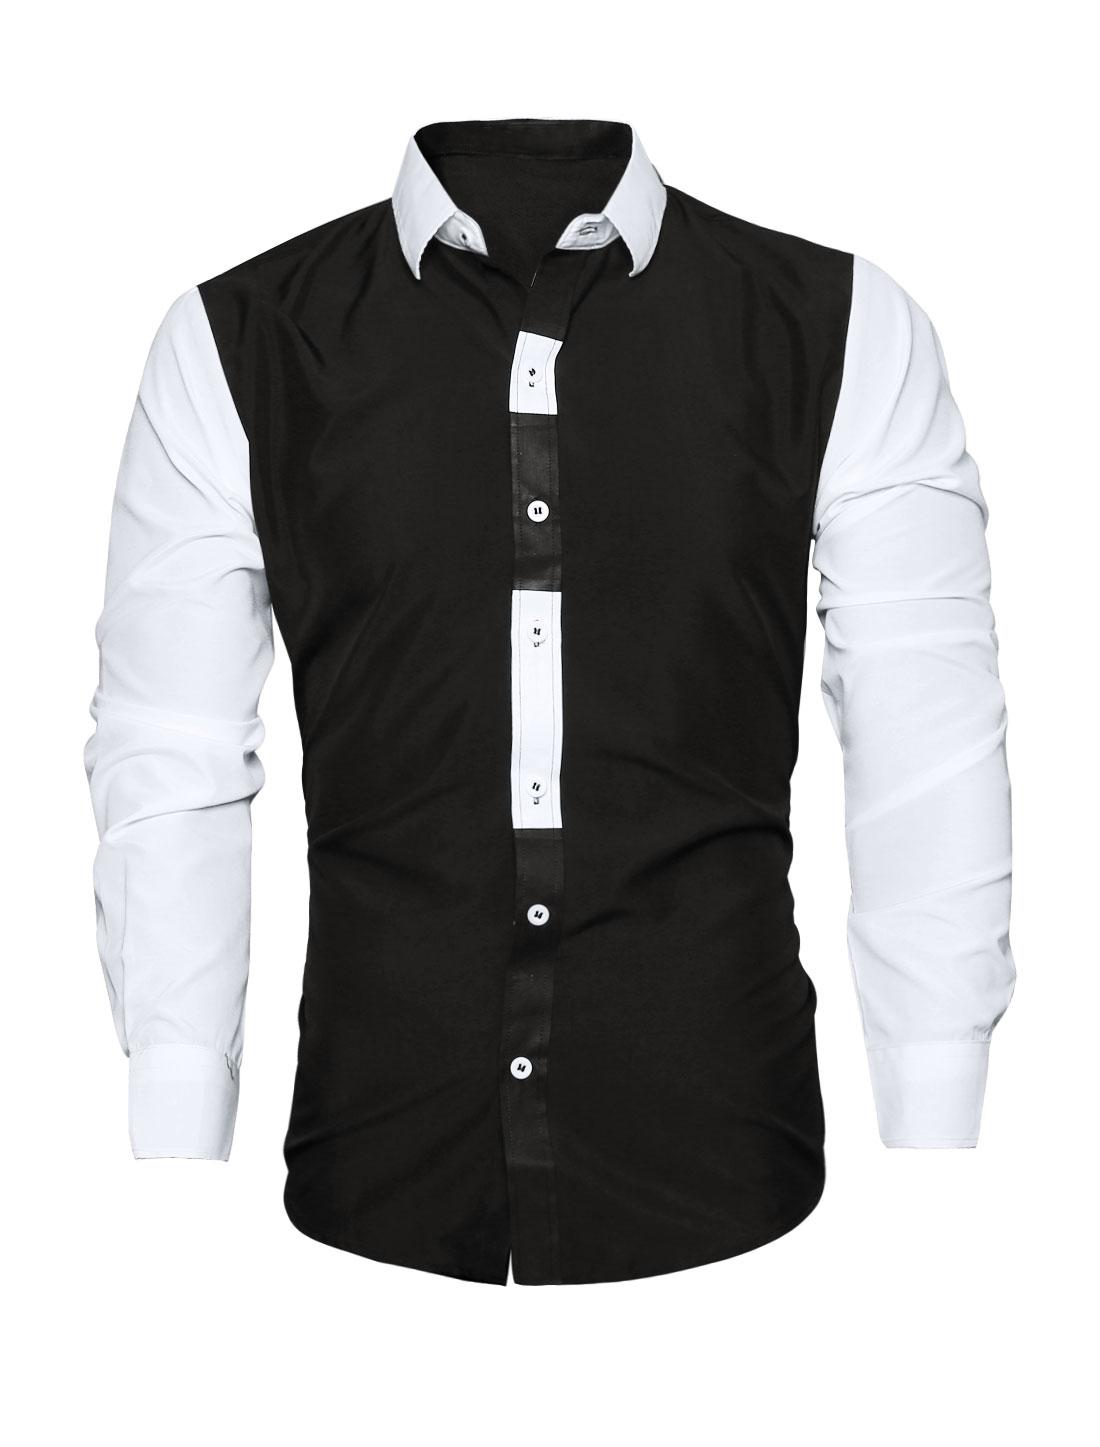 Men Collared Long Sleeves Color Block Slim Fit Shirt Black M